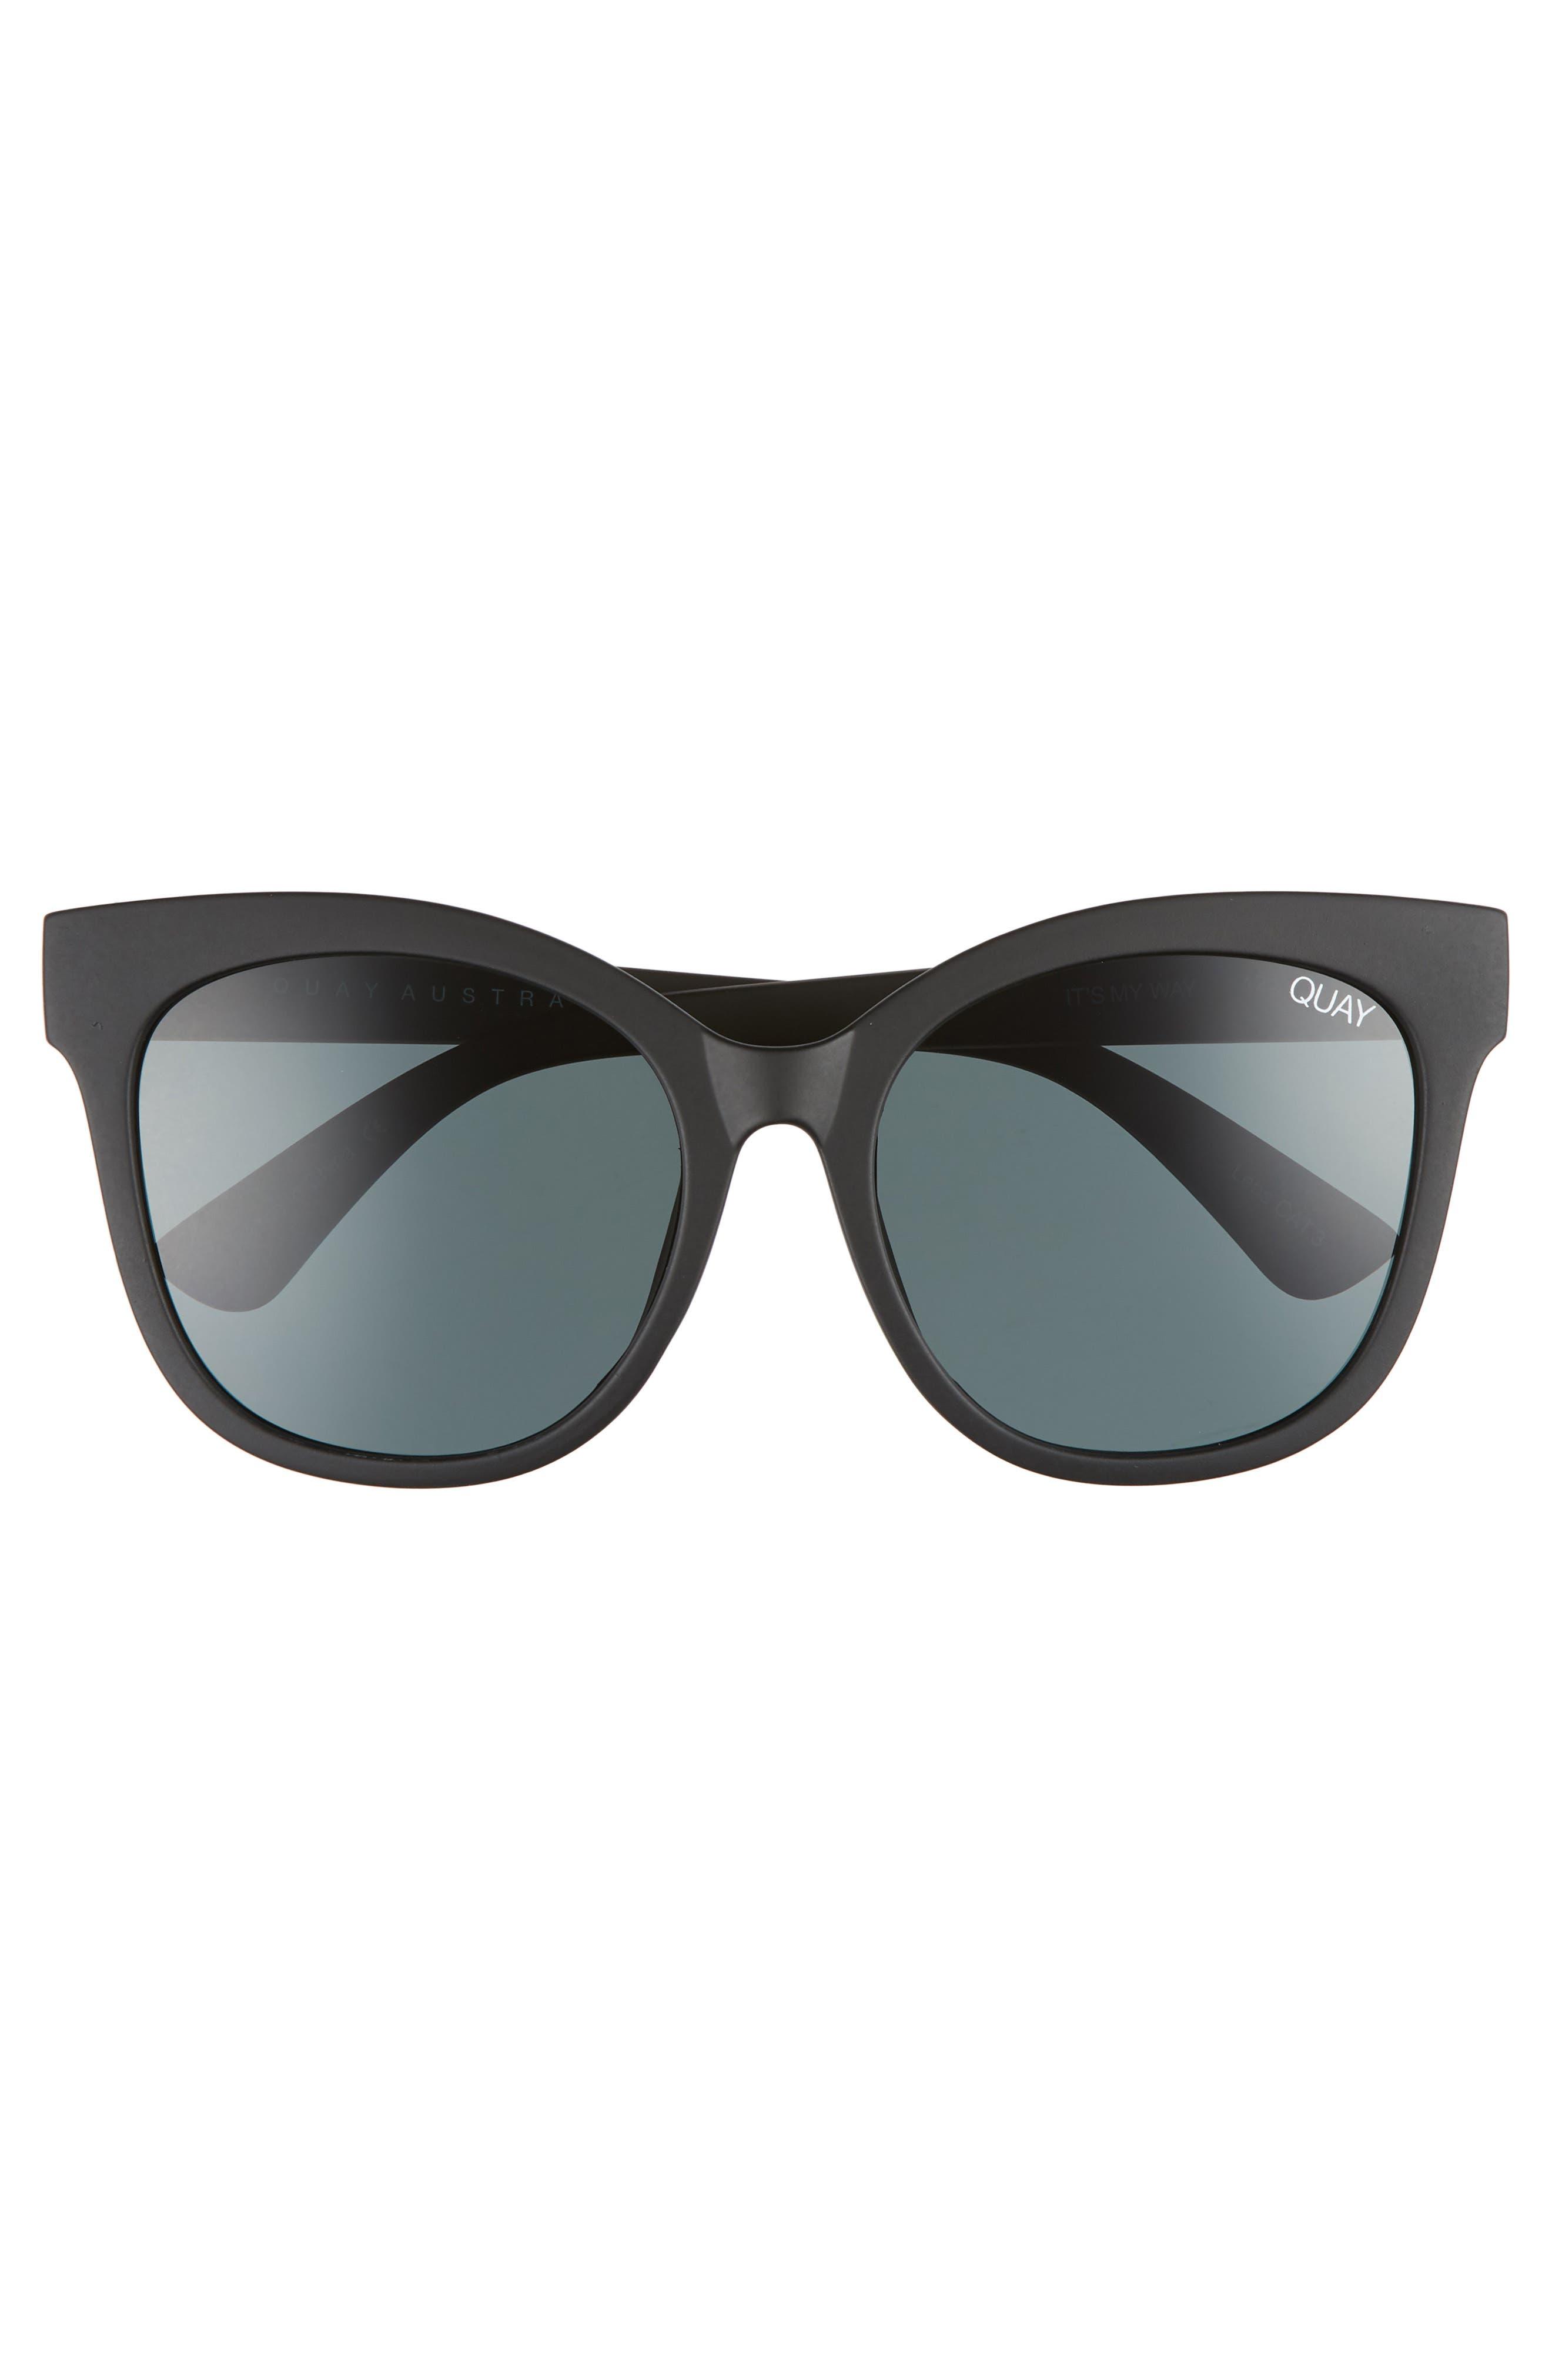 QUAY AUSTRALIA, It's My Way 55mm Sunglasses, Alternate thumbnail 3, color, BLACK/ SMOKE